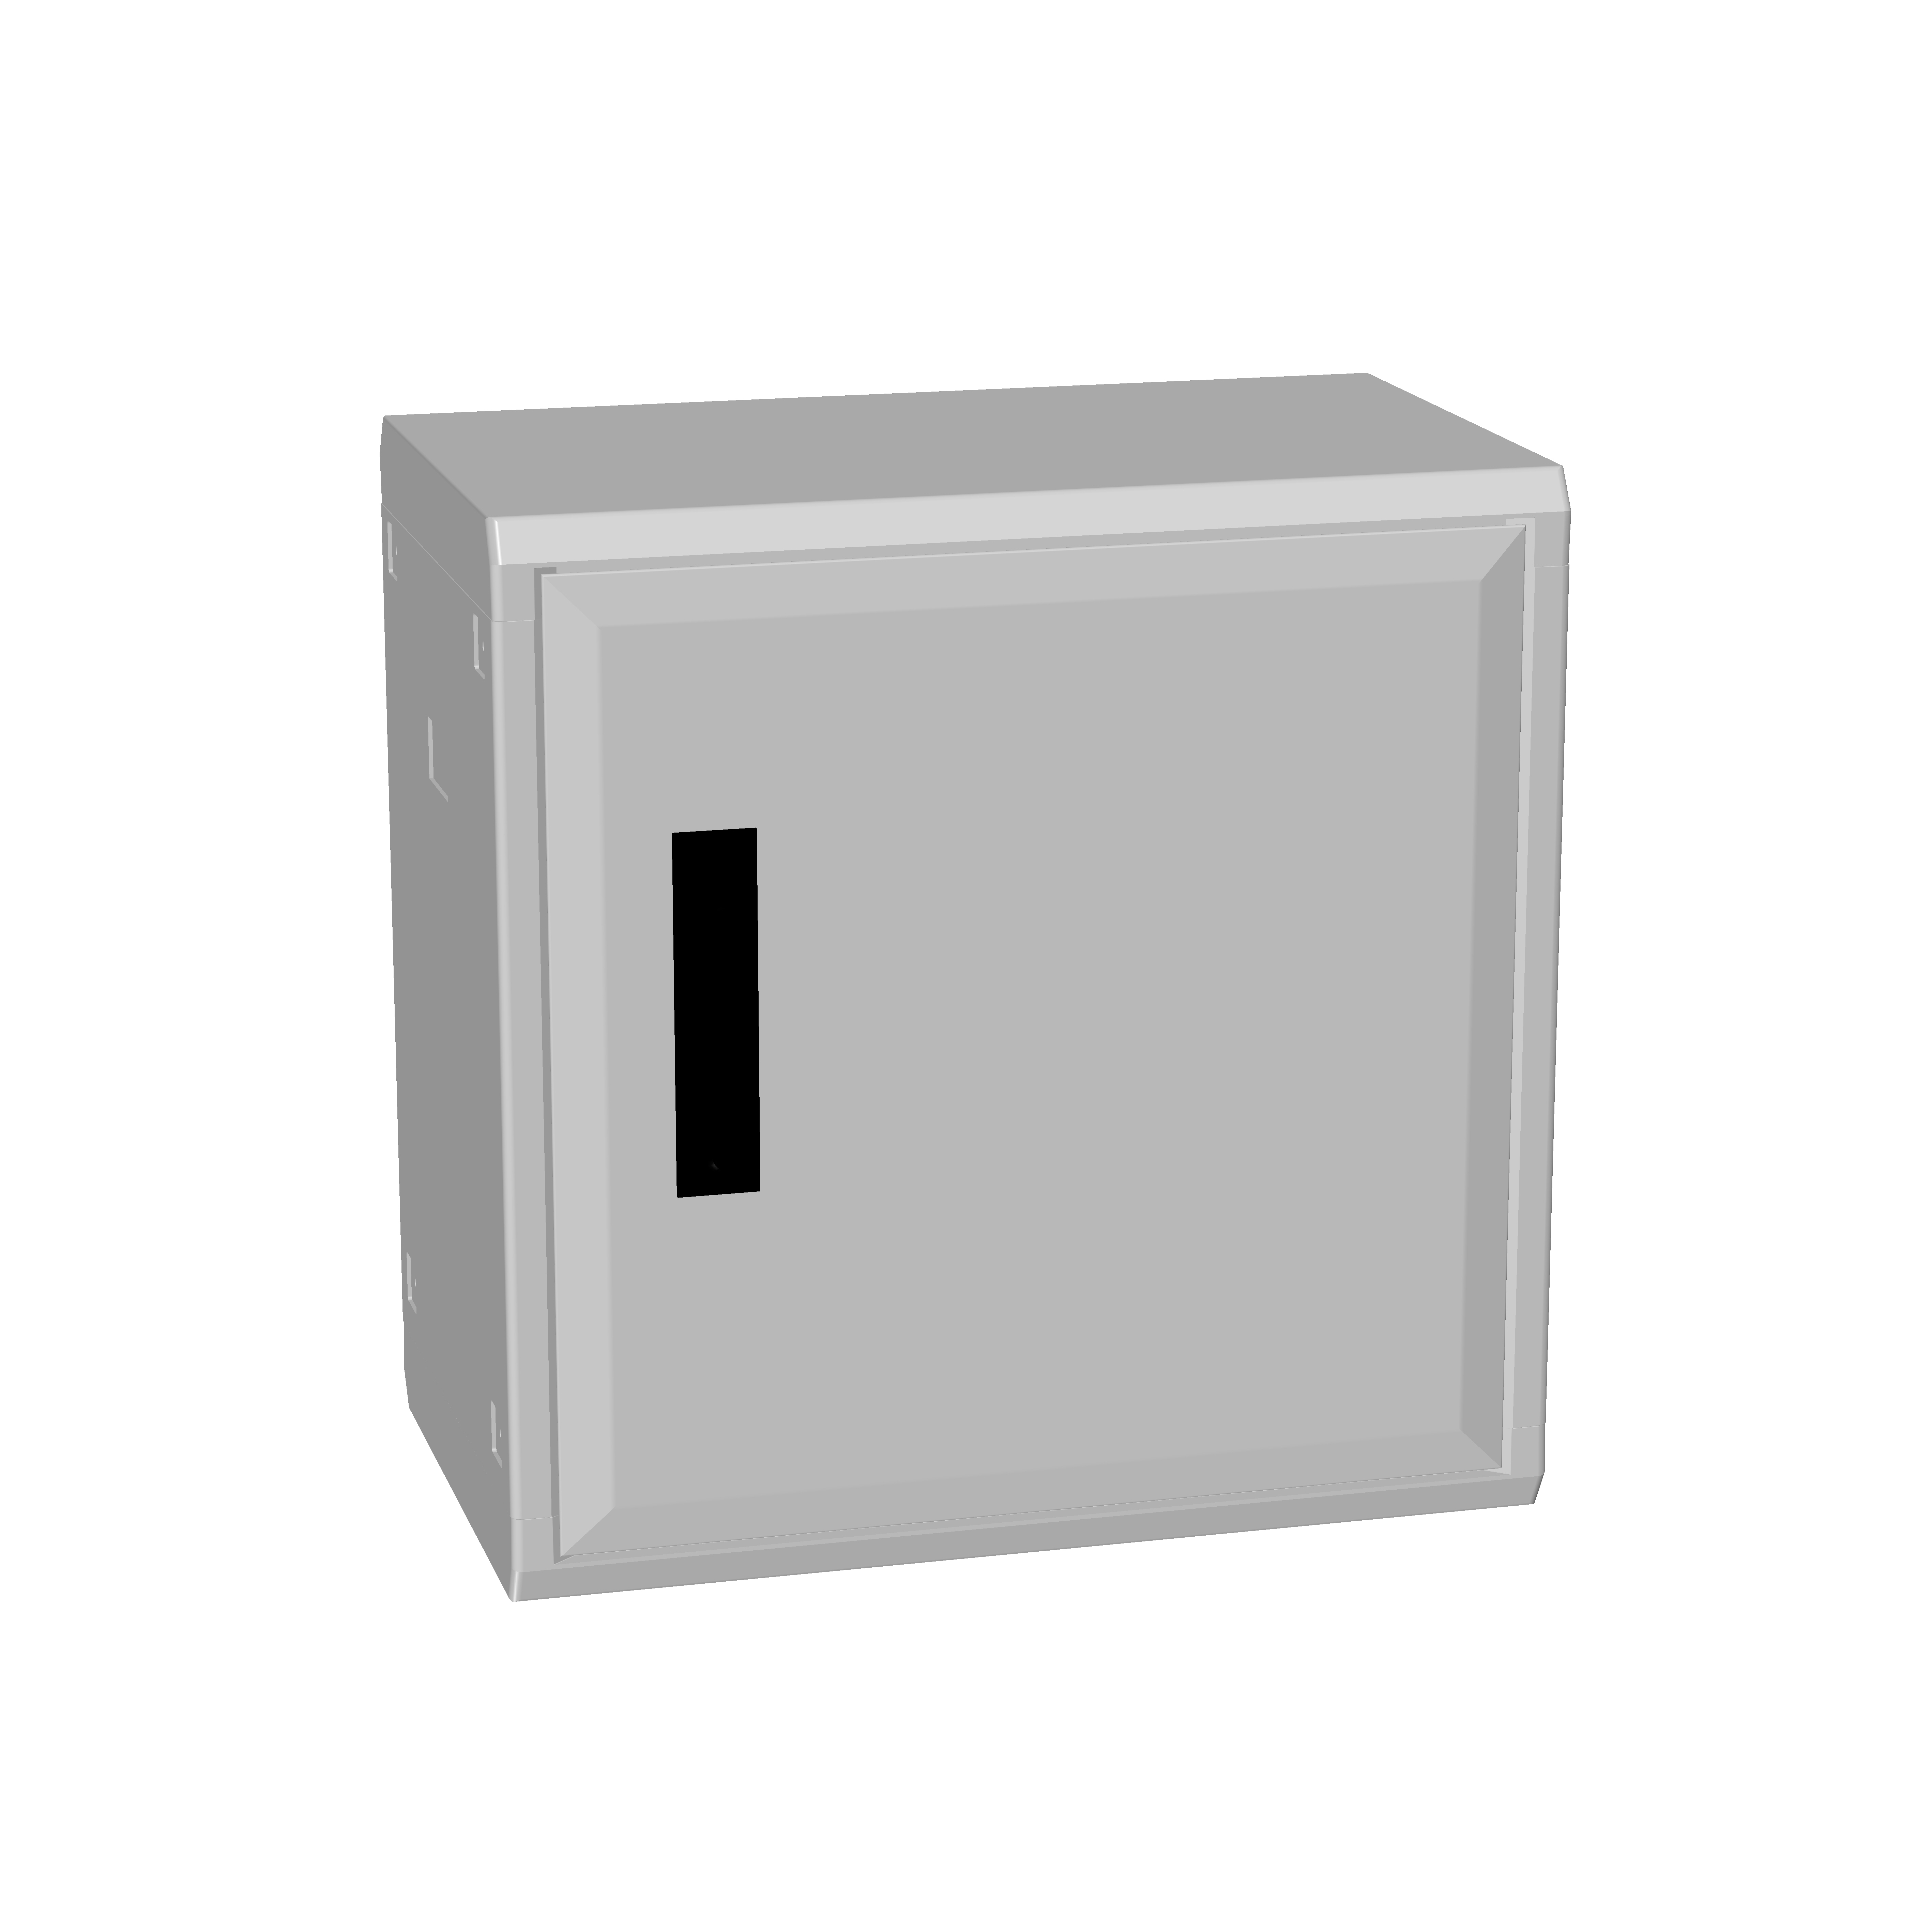 1 Stk Polyesterschrank, eintürig, 500x500x312 POCC2230--